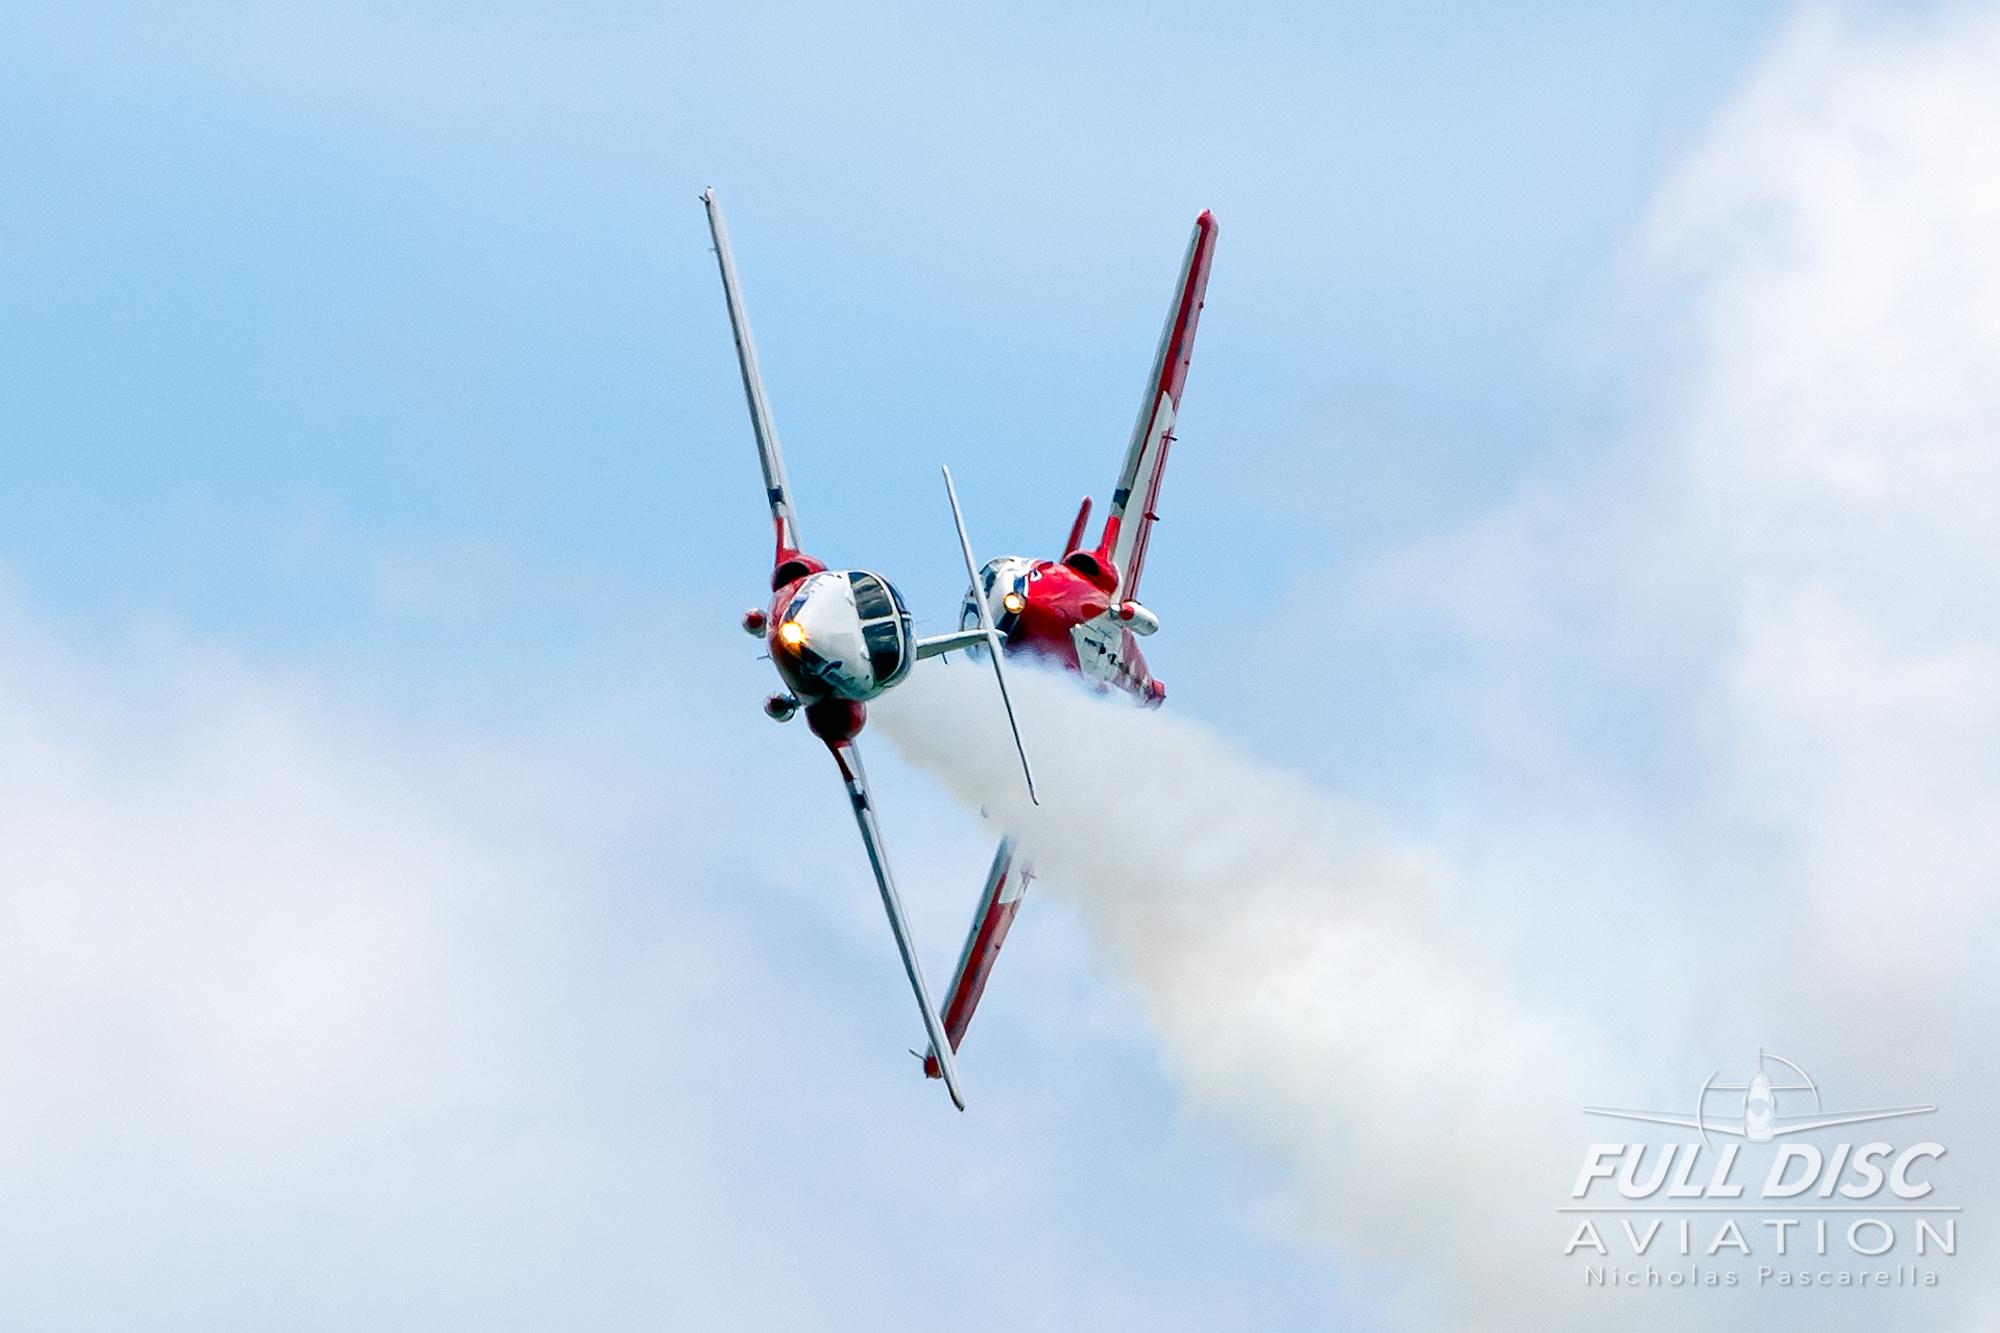 nickpascarella_fulldiscaviation_oceancityairshow_aviation_snowbirds_crossup.jpg